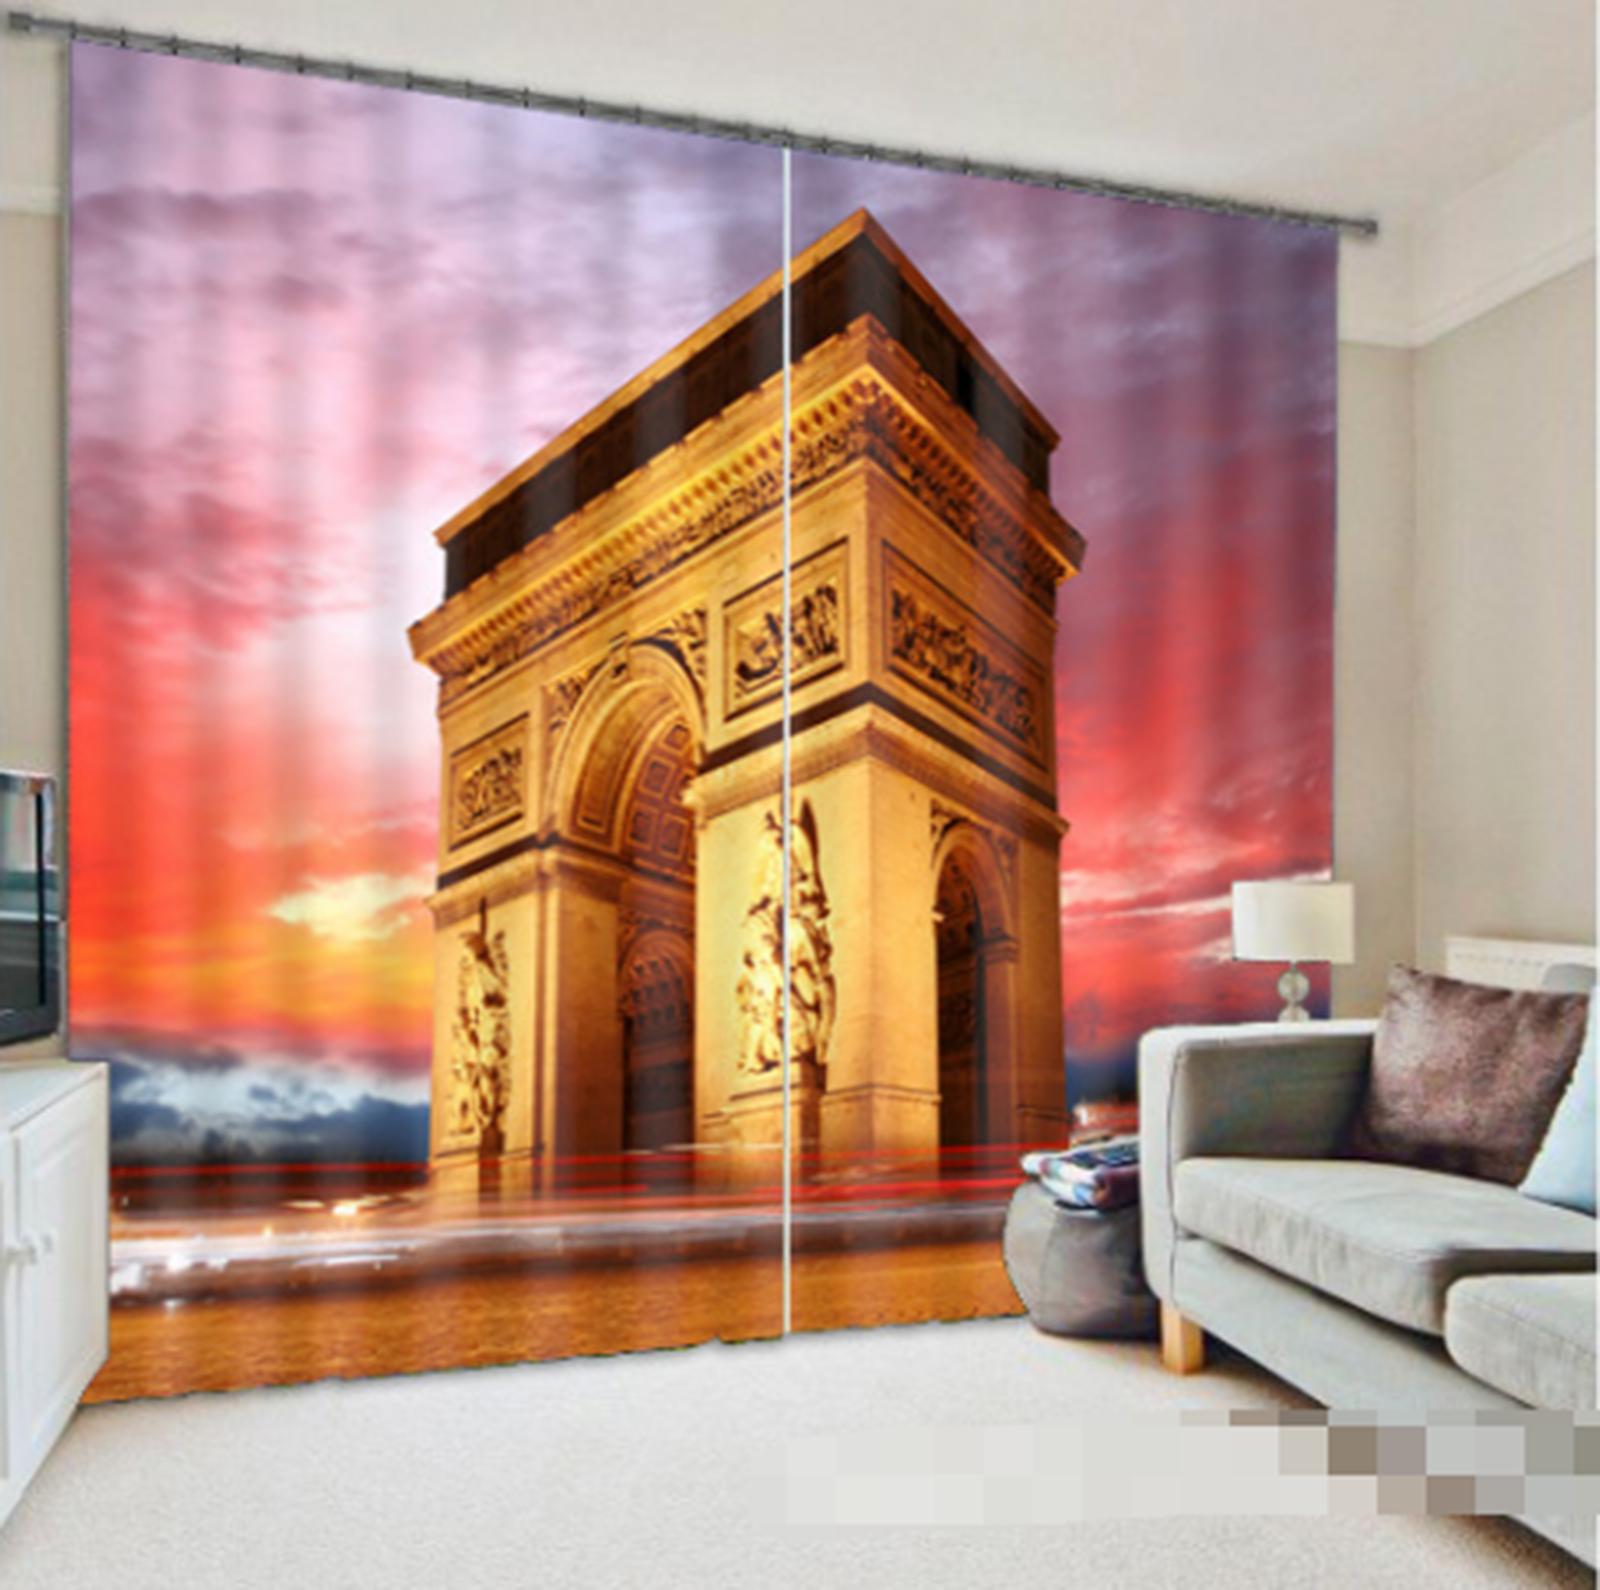 3D Door France0287 Blockout Photo Curtain Print Curtains Drapes Fabric Window UK - $145.49 - $363.75